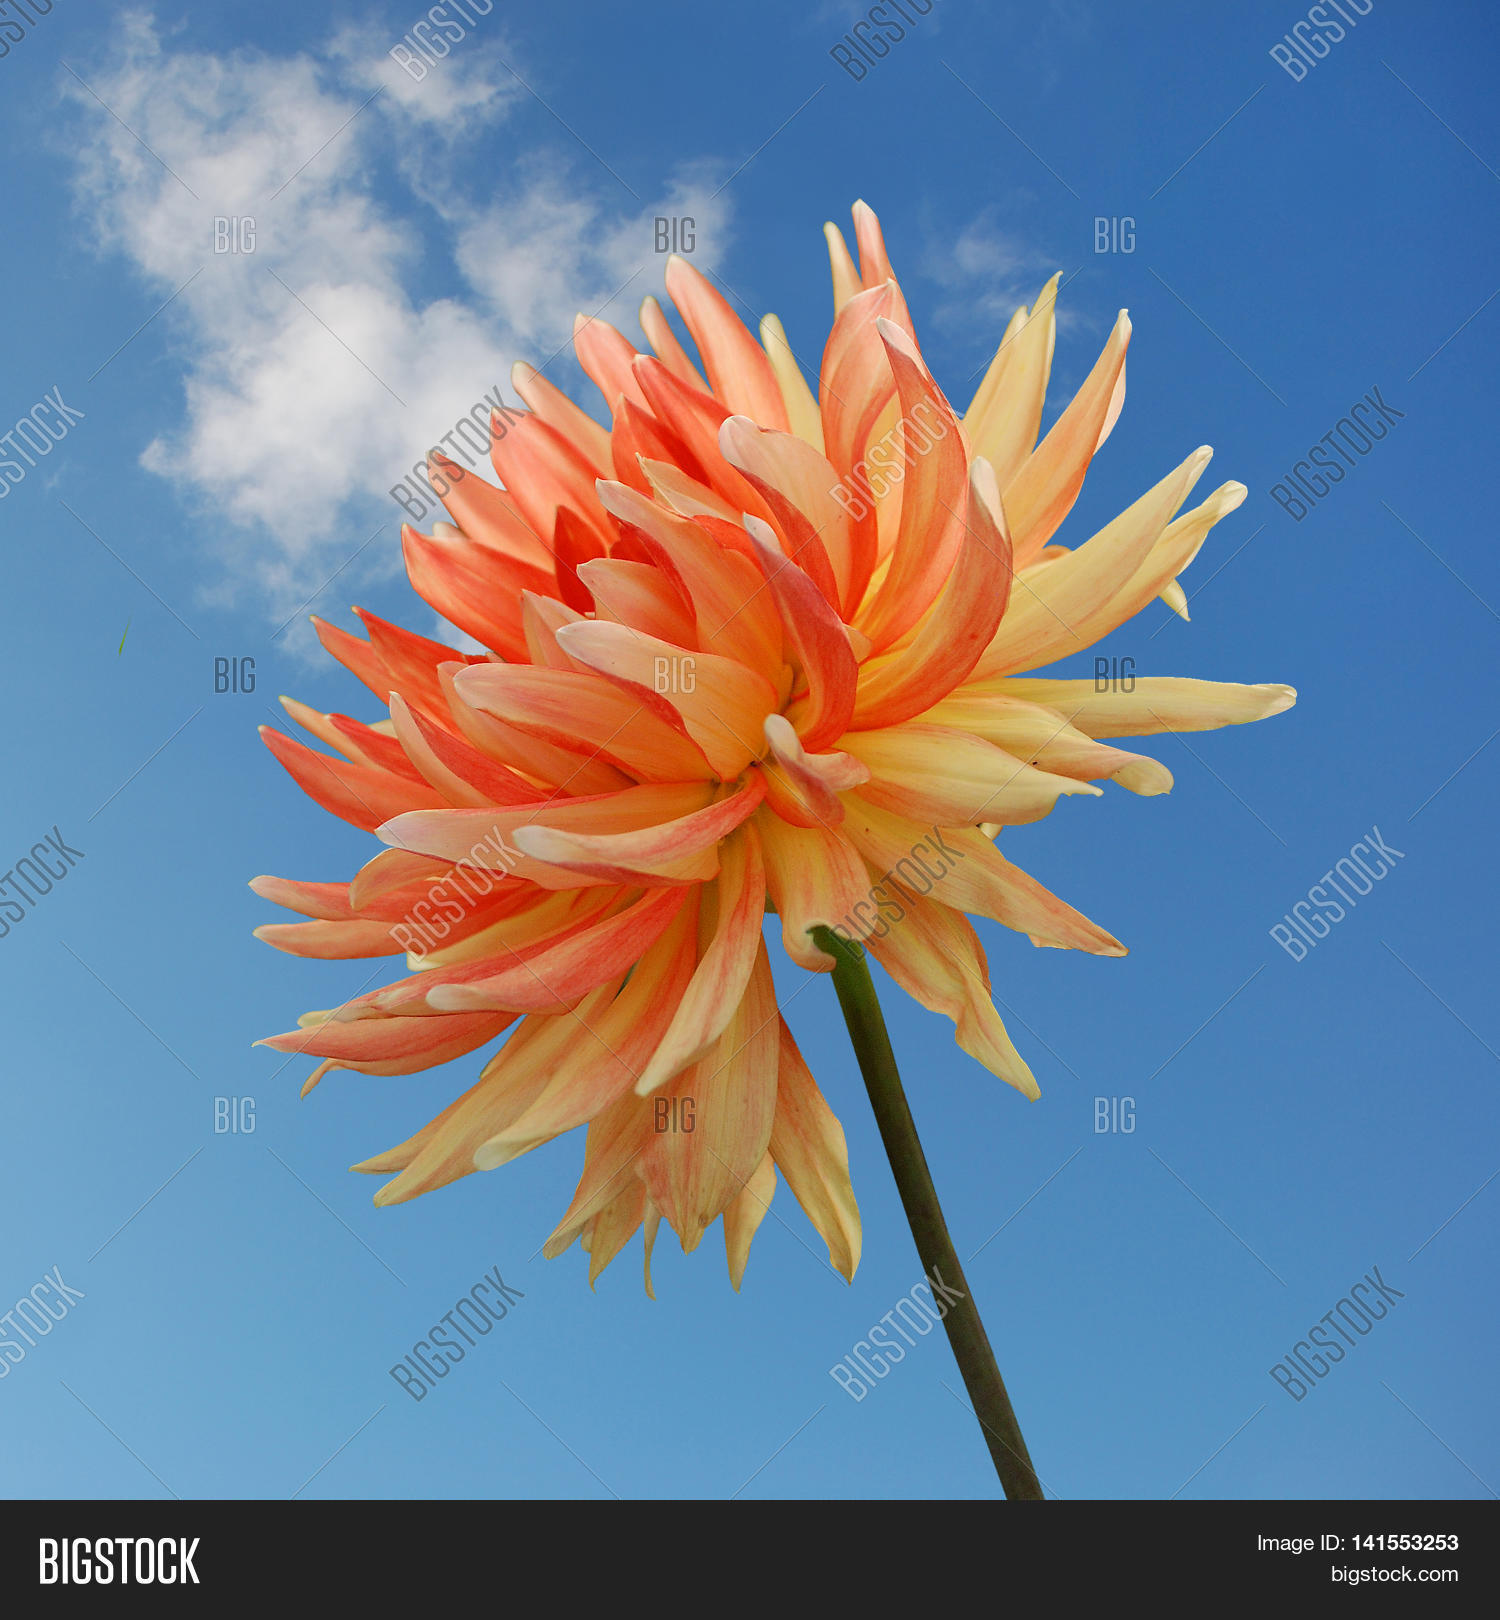 Orange Dahlia Flower Image Photo Free Trial Bigstock